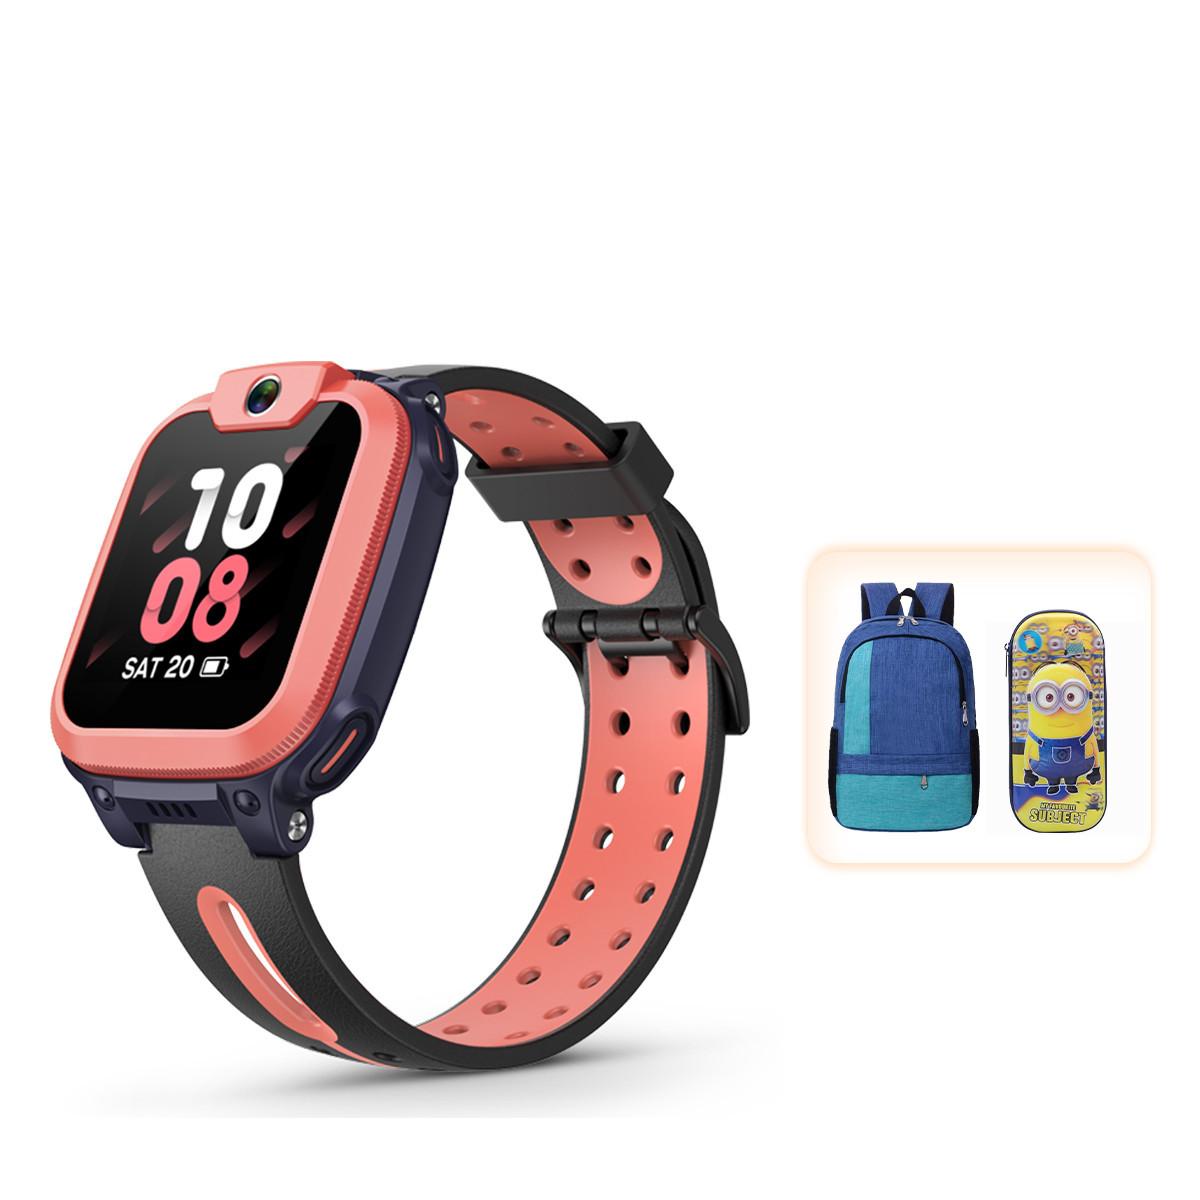 Q1A 智能手表(GPS、北斗、扬声器)